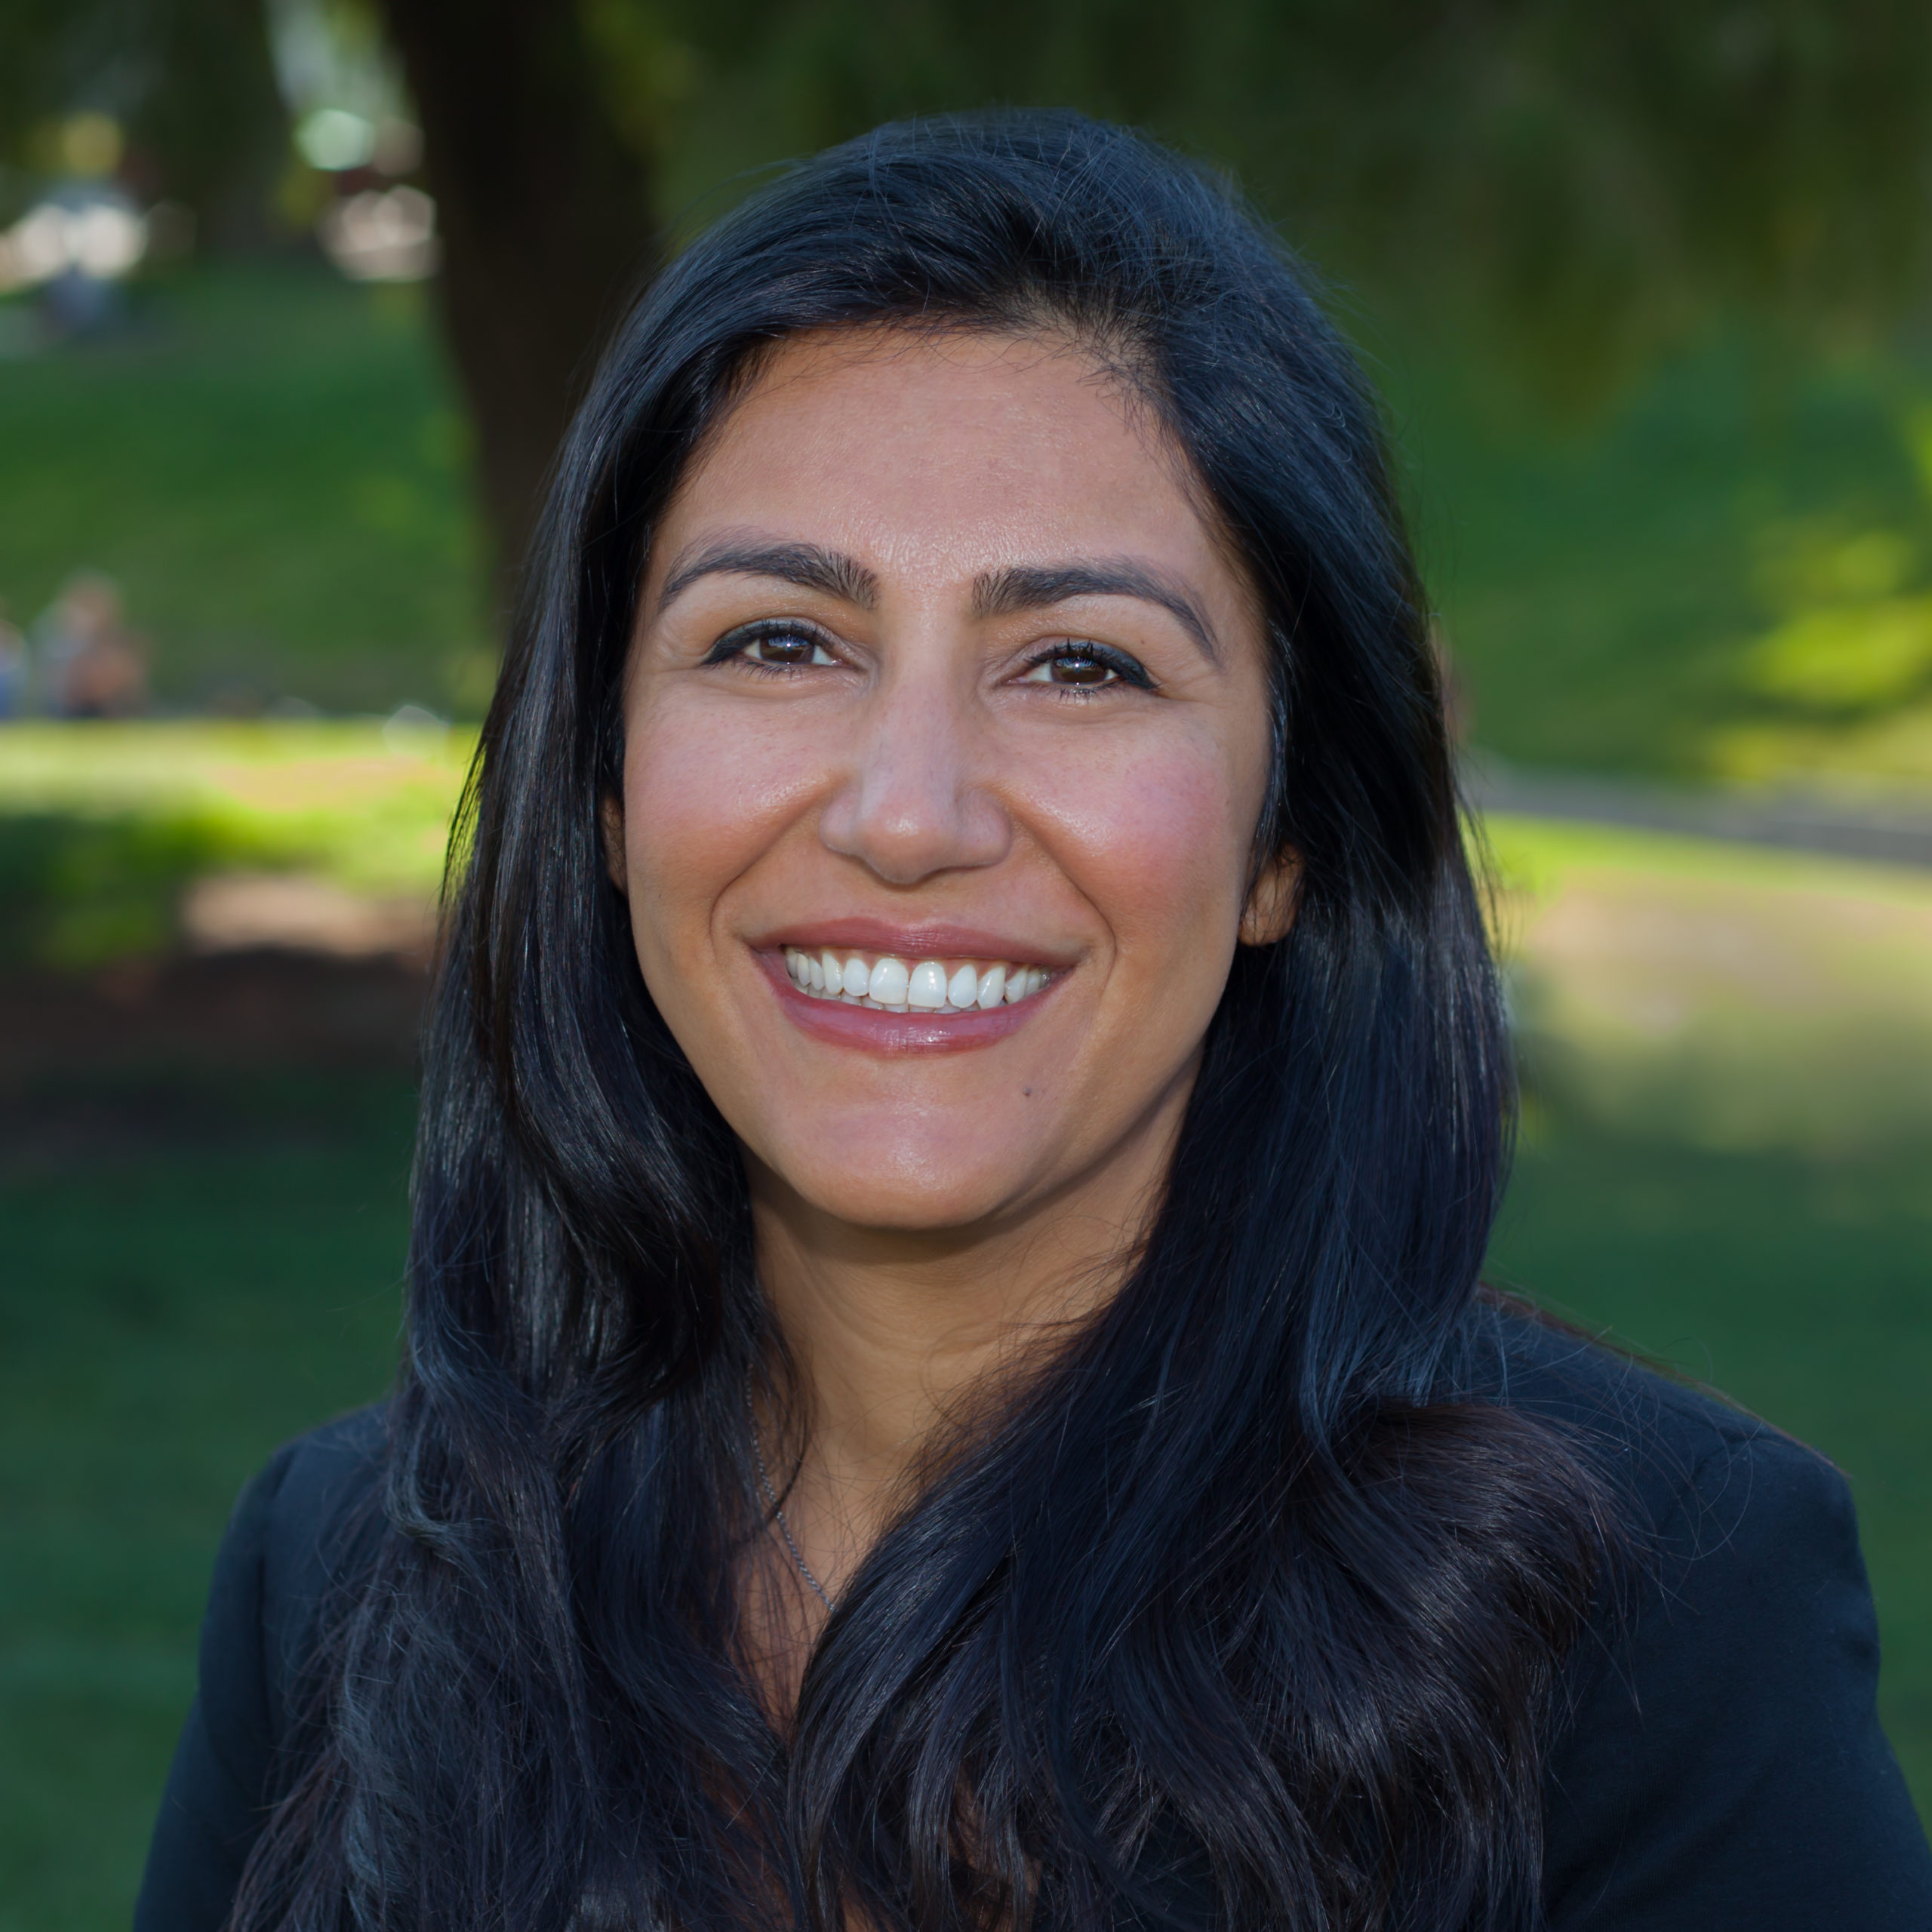 An image of loan advisor Kathy Derangi